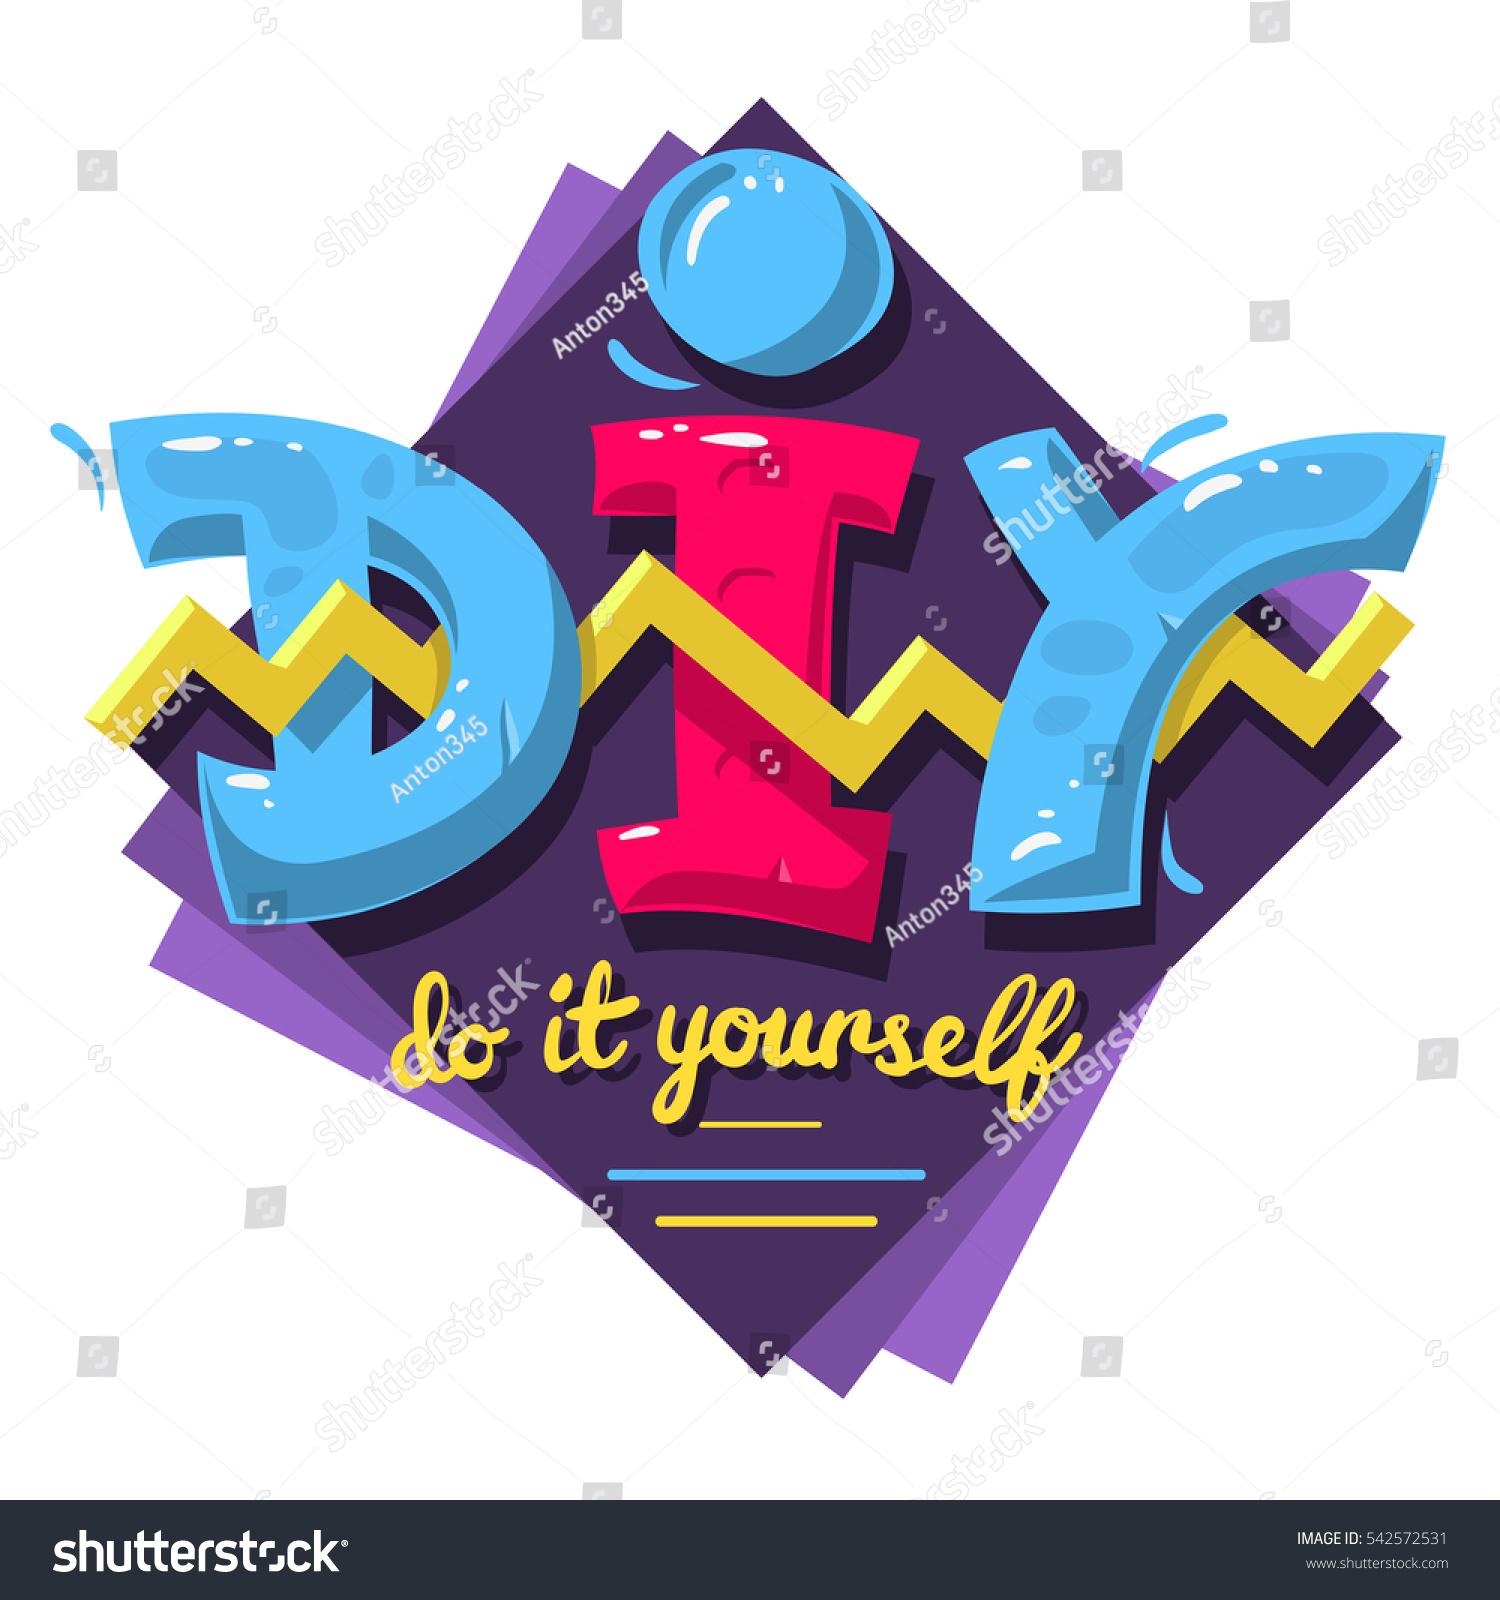 Diy acronym do yourself 90 s vibrant stock vector 2018 542572531 diy acronym do it yourself 90s vibrant colors aesthetic type label design on a solutioingenieria Gallery